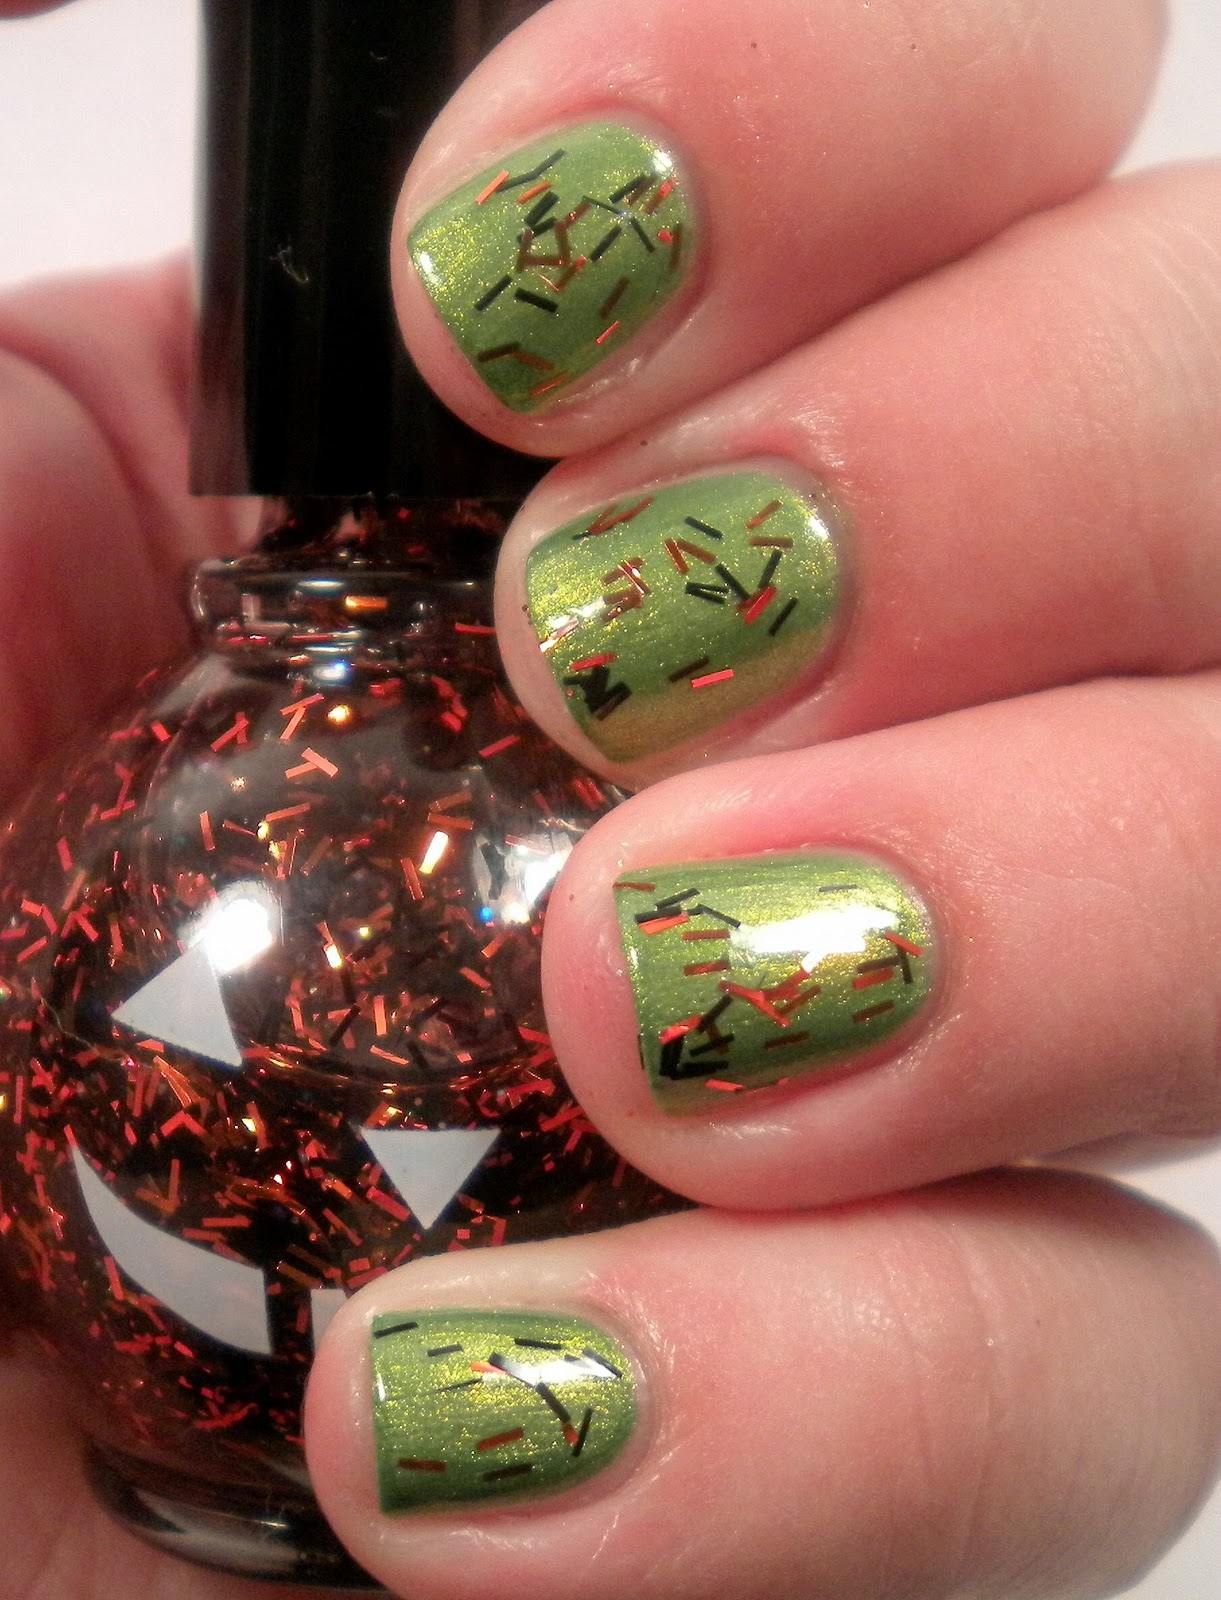 How To Paint Halloween Pumpkin Nails Nails Manicure | Auto Design Tech